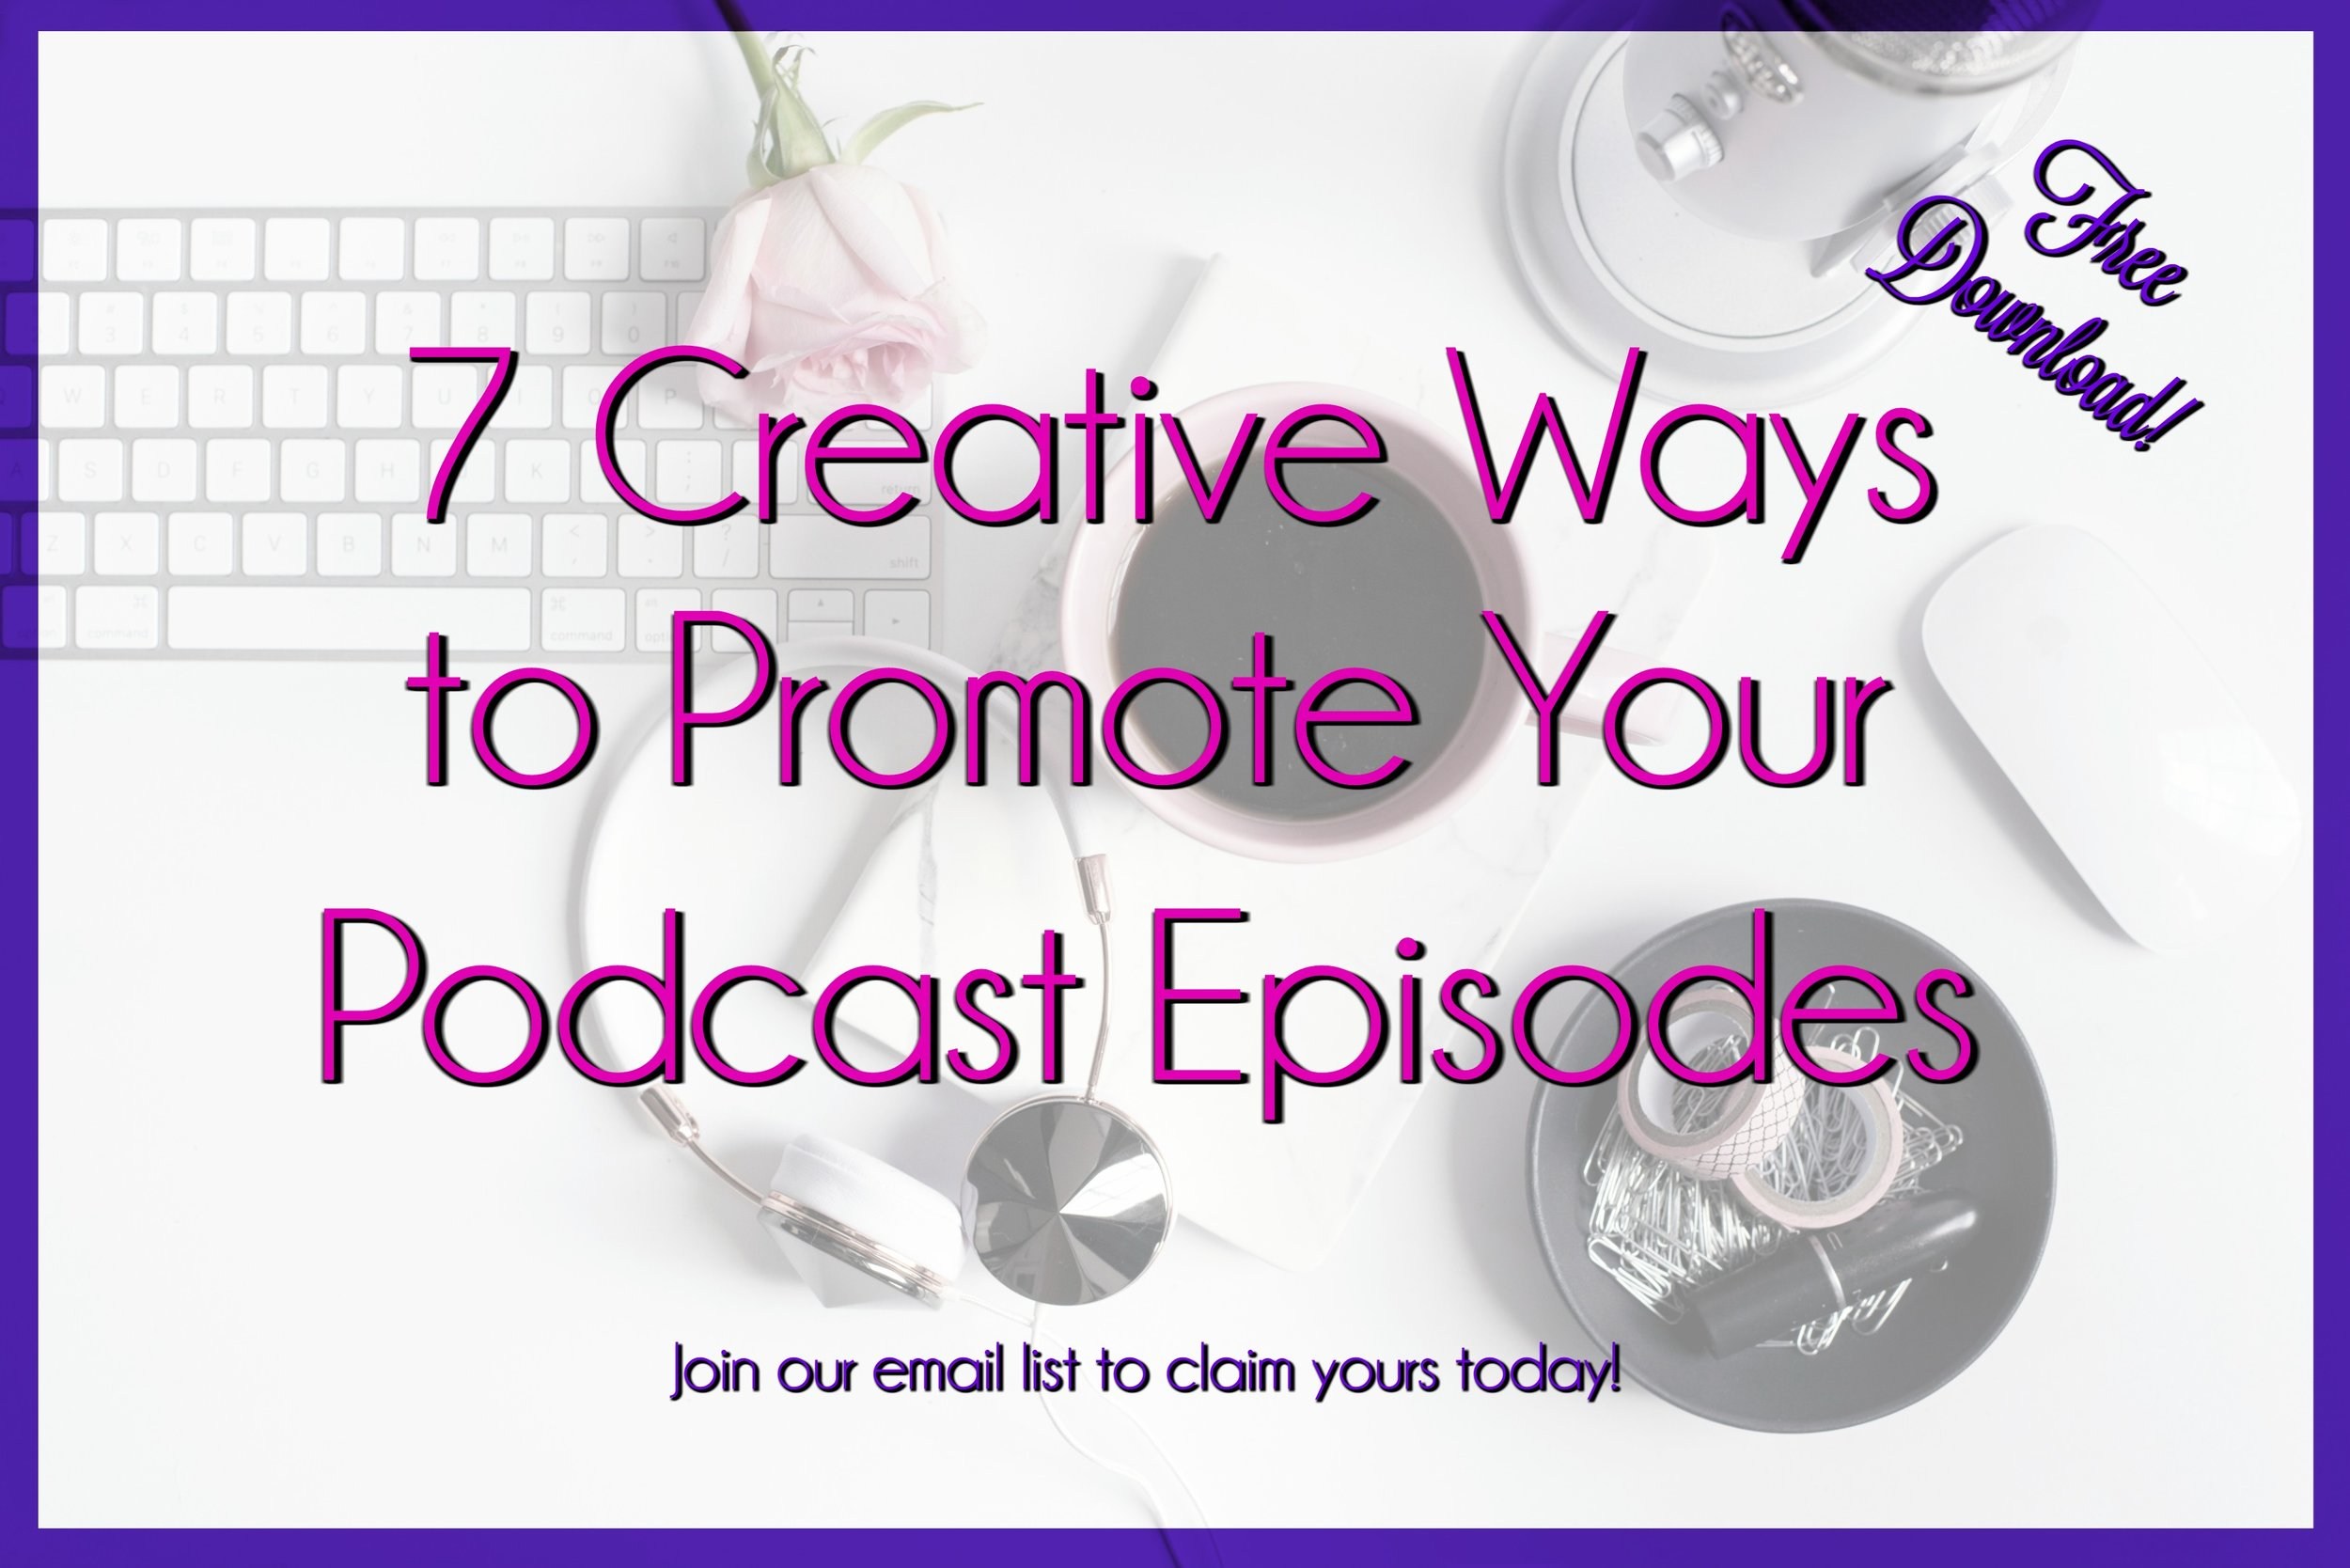 7-Creative-Ways-Promote-Podcast-Episodes